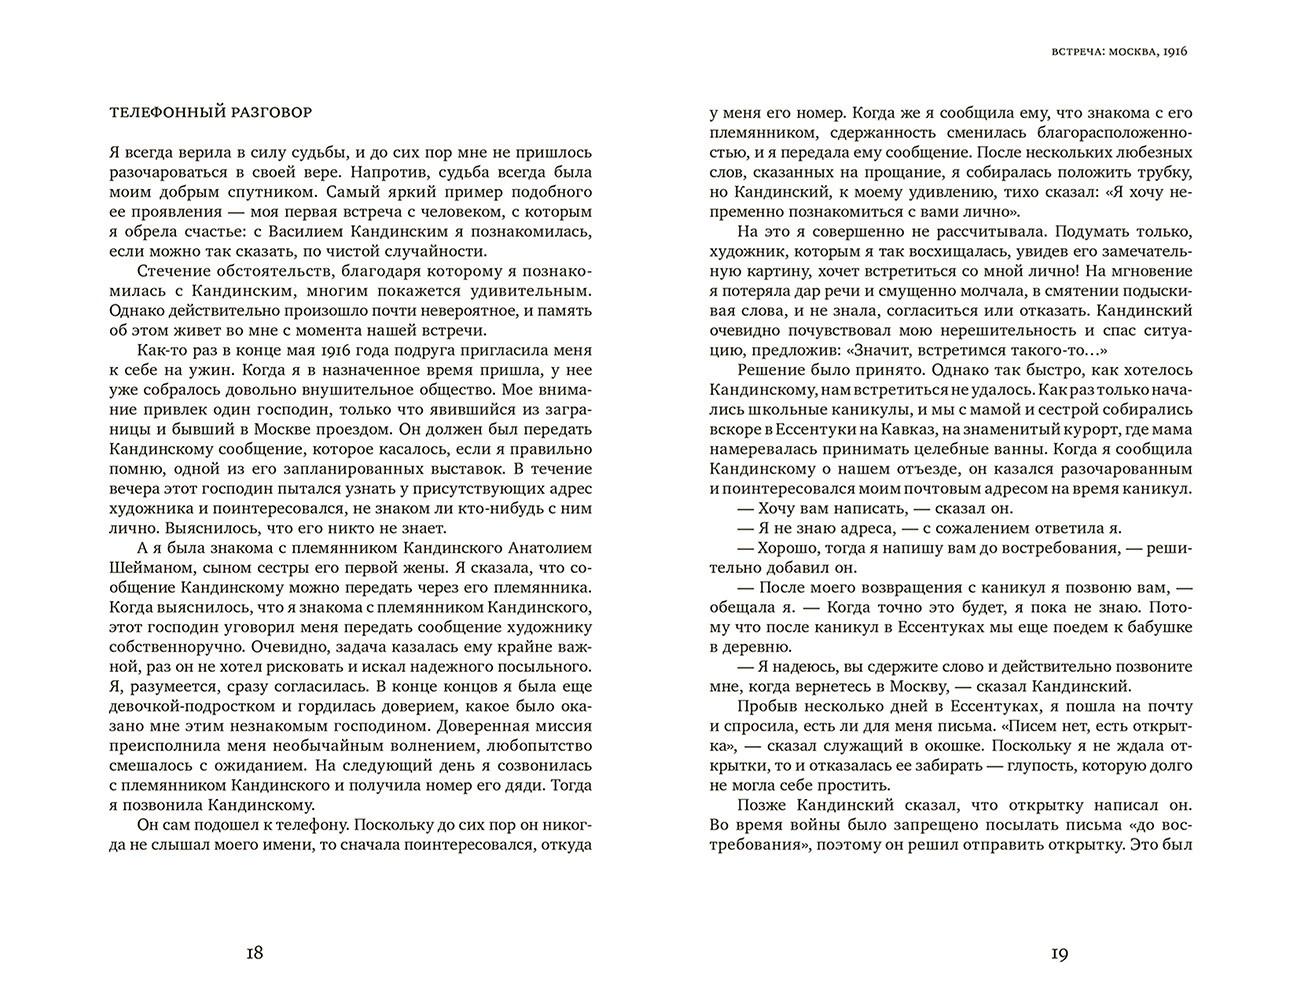 kandinsky-1